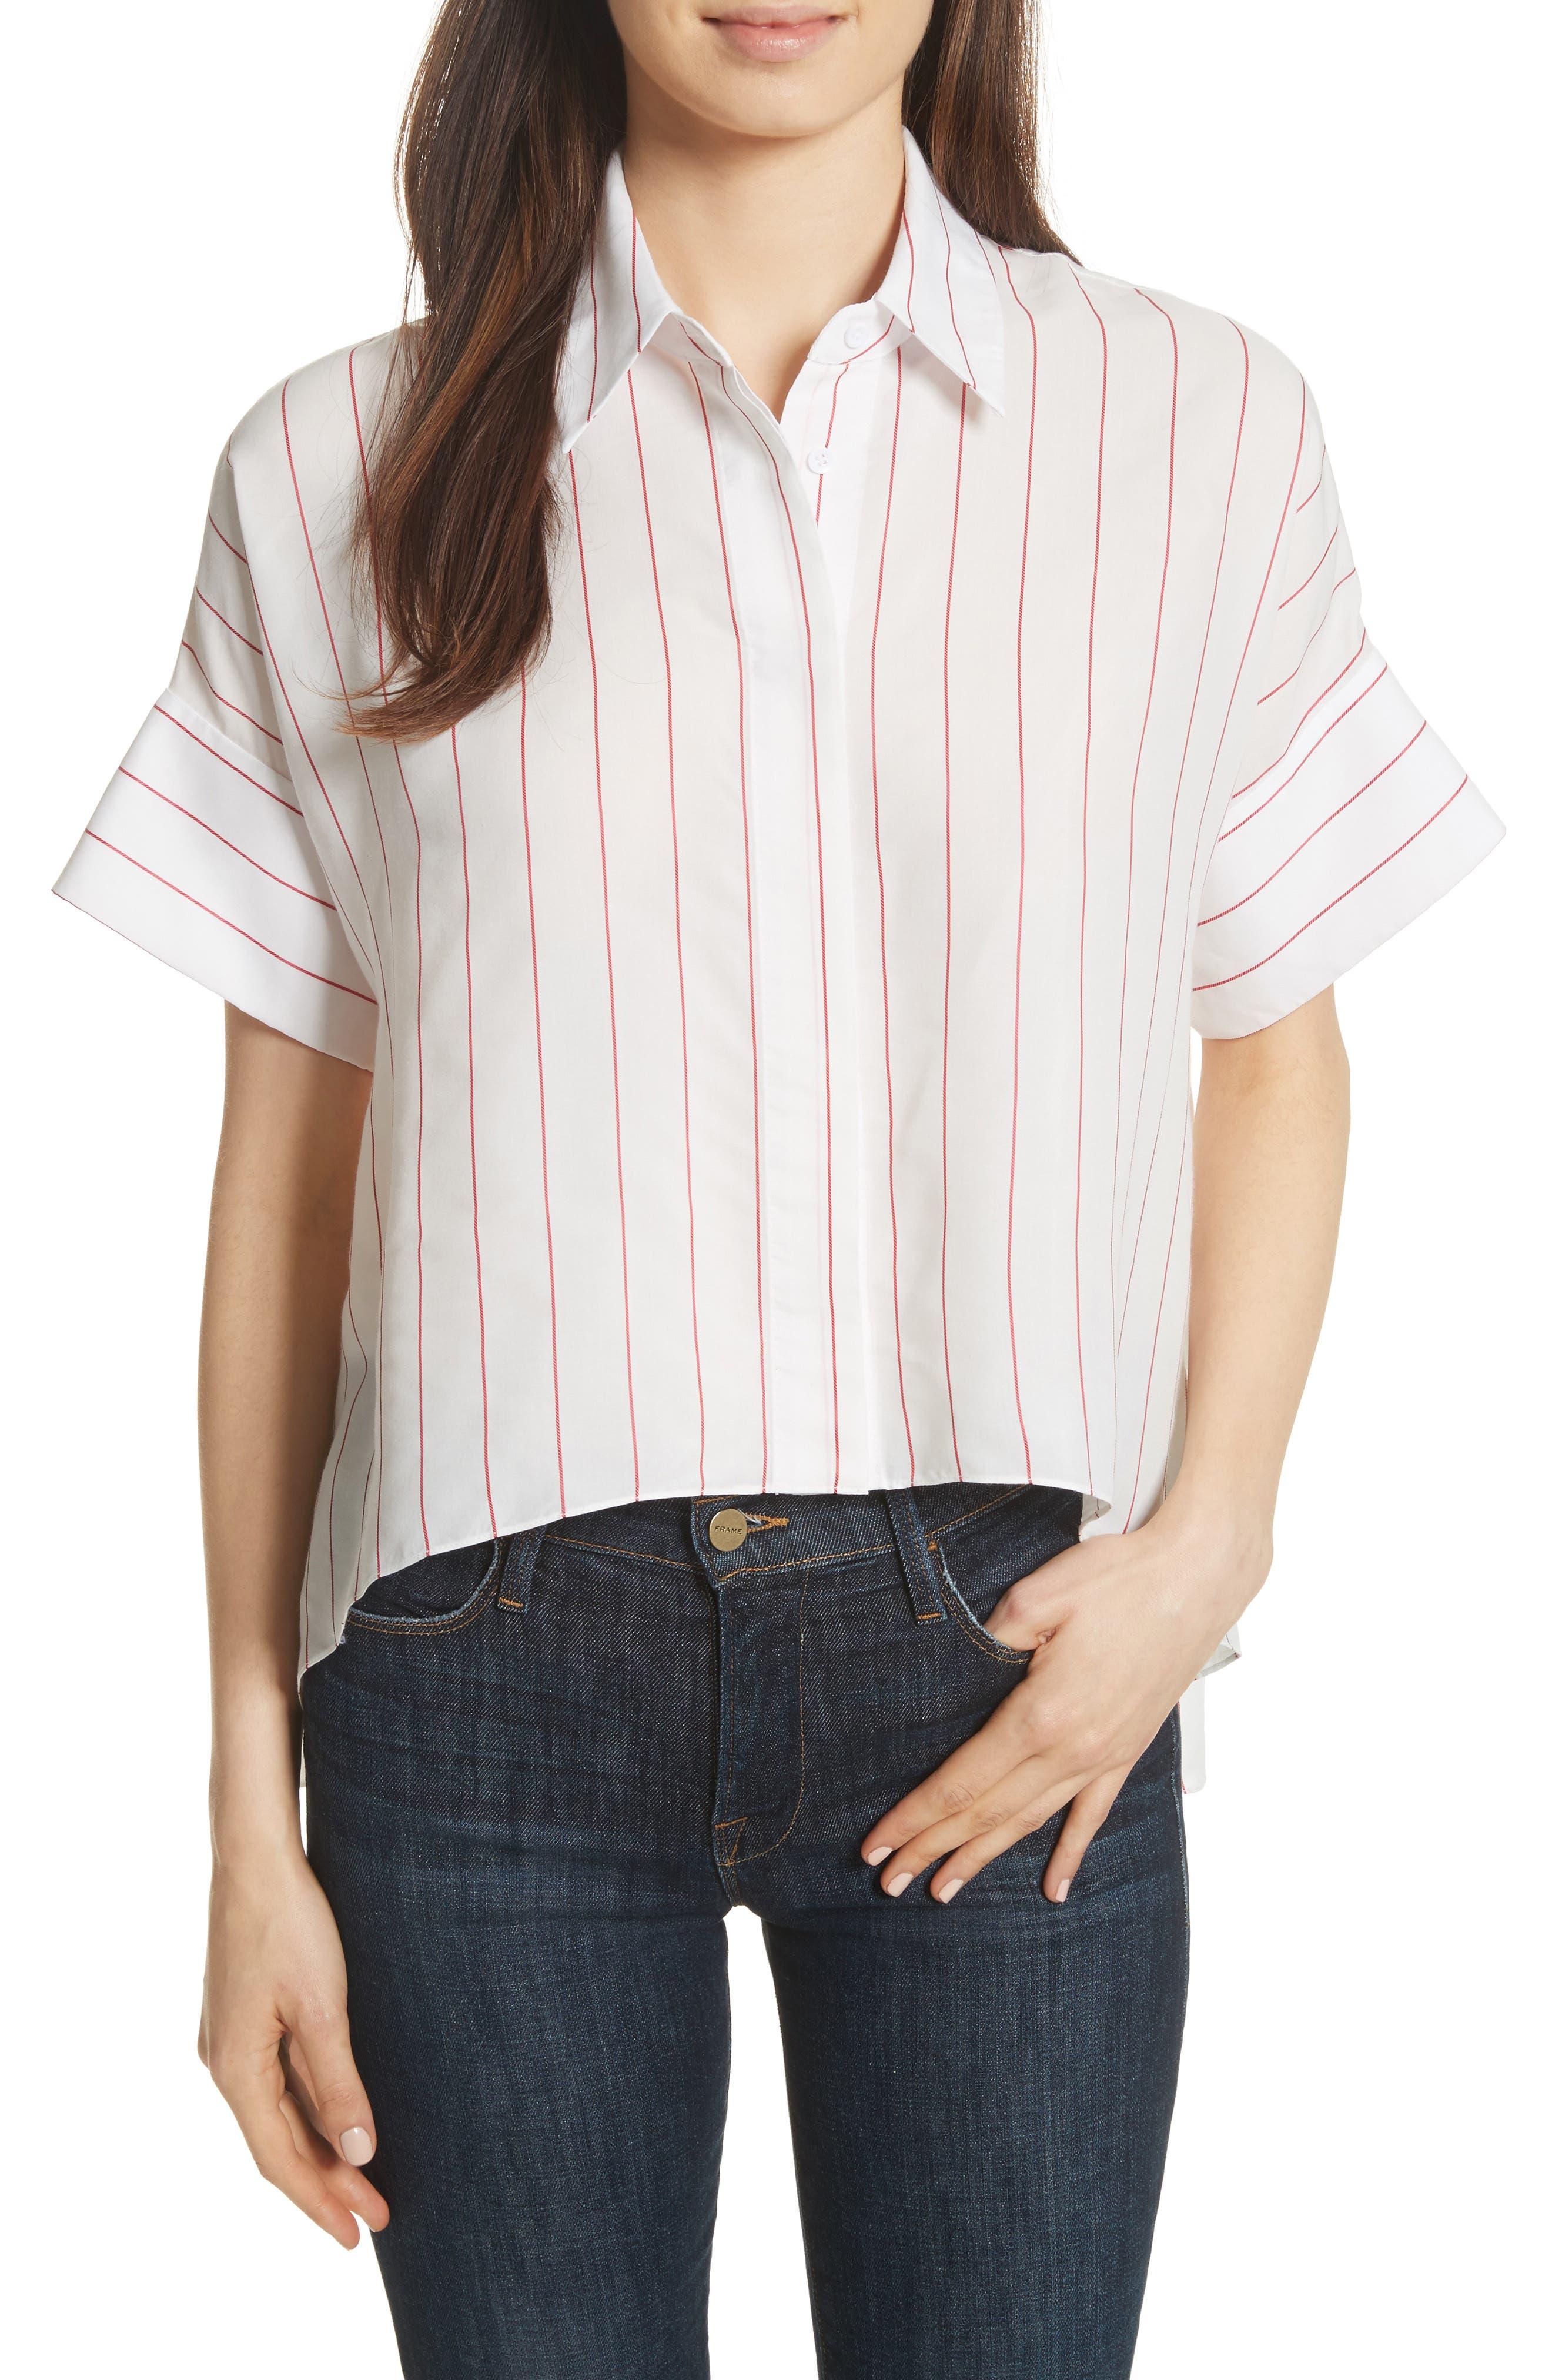 Main Image - Alice + Olivia Edyth High/Low Button Down Shirt